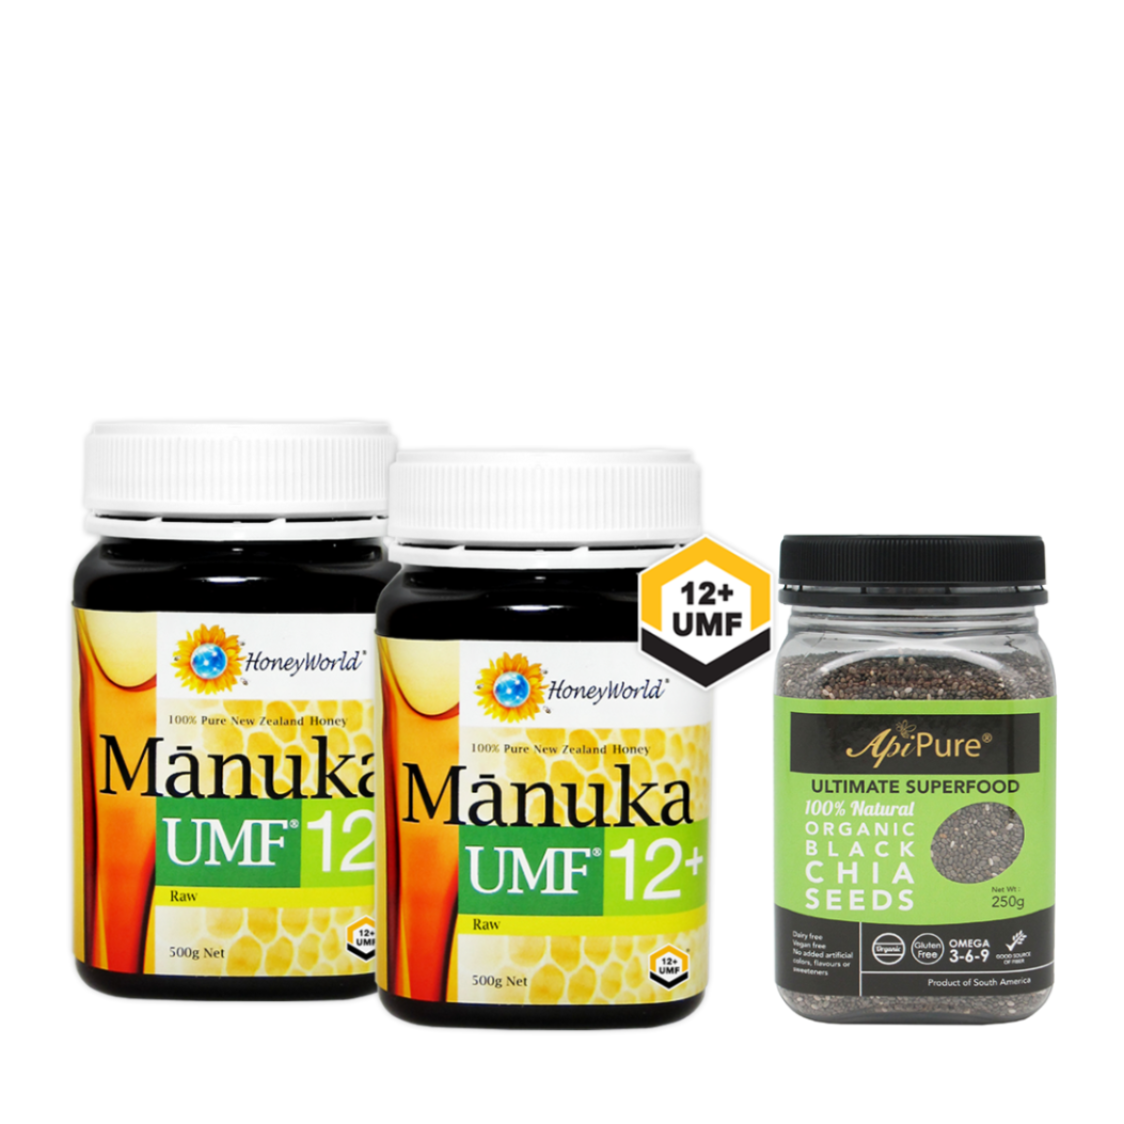 Honeyworld Raw Manuka UMF12 500g Twin  Apipure Organic Black Chia Seed 250g Metro Exclusive